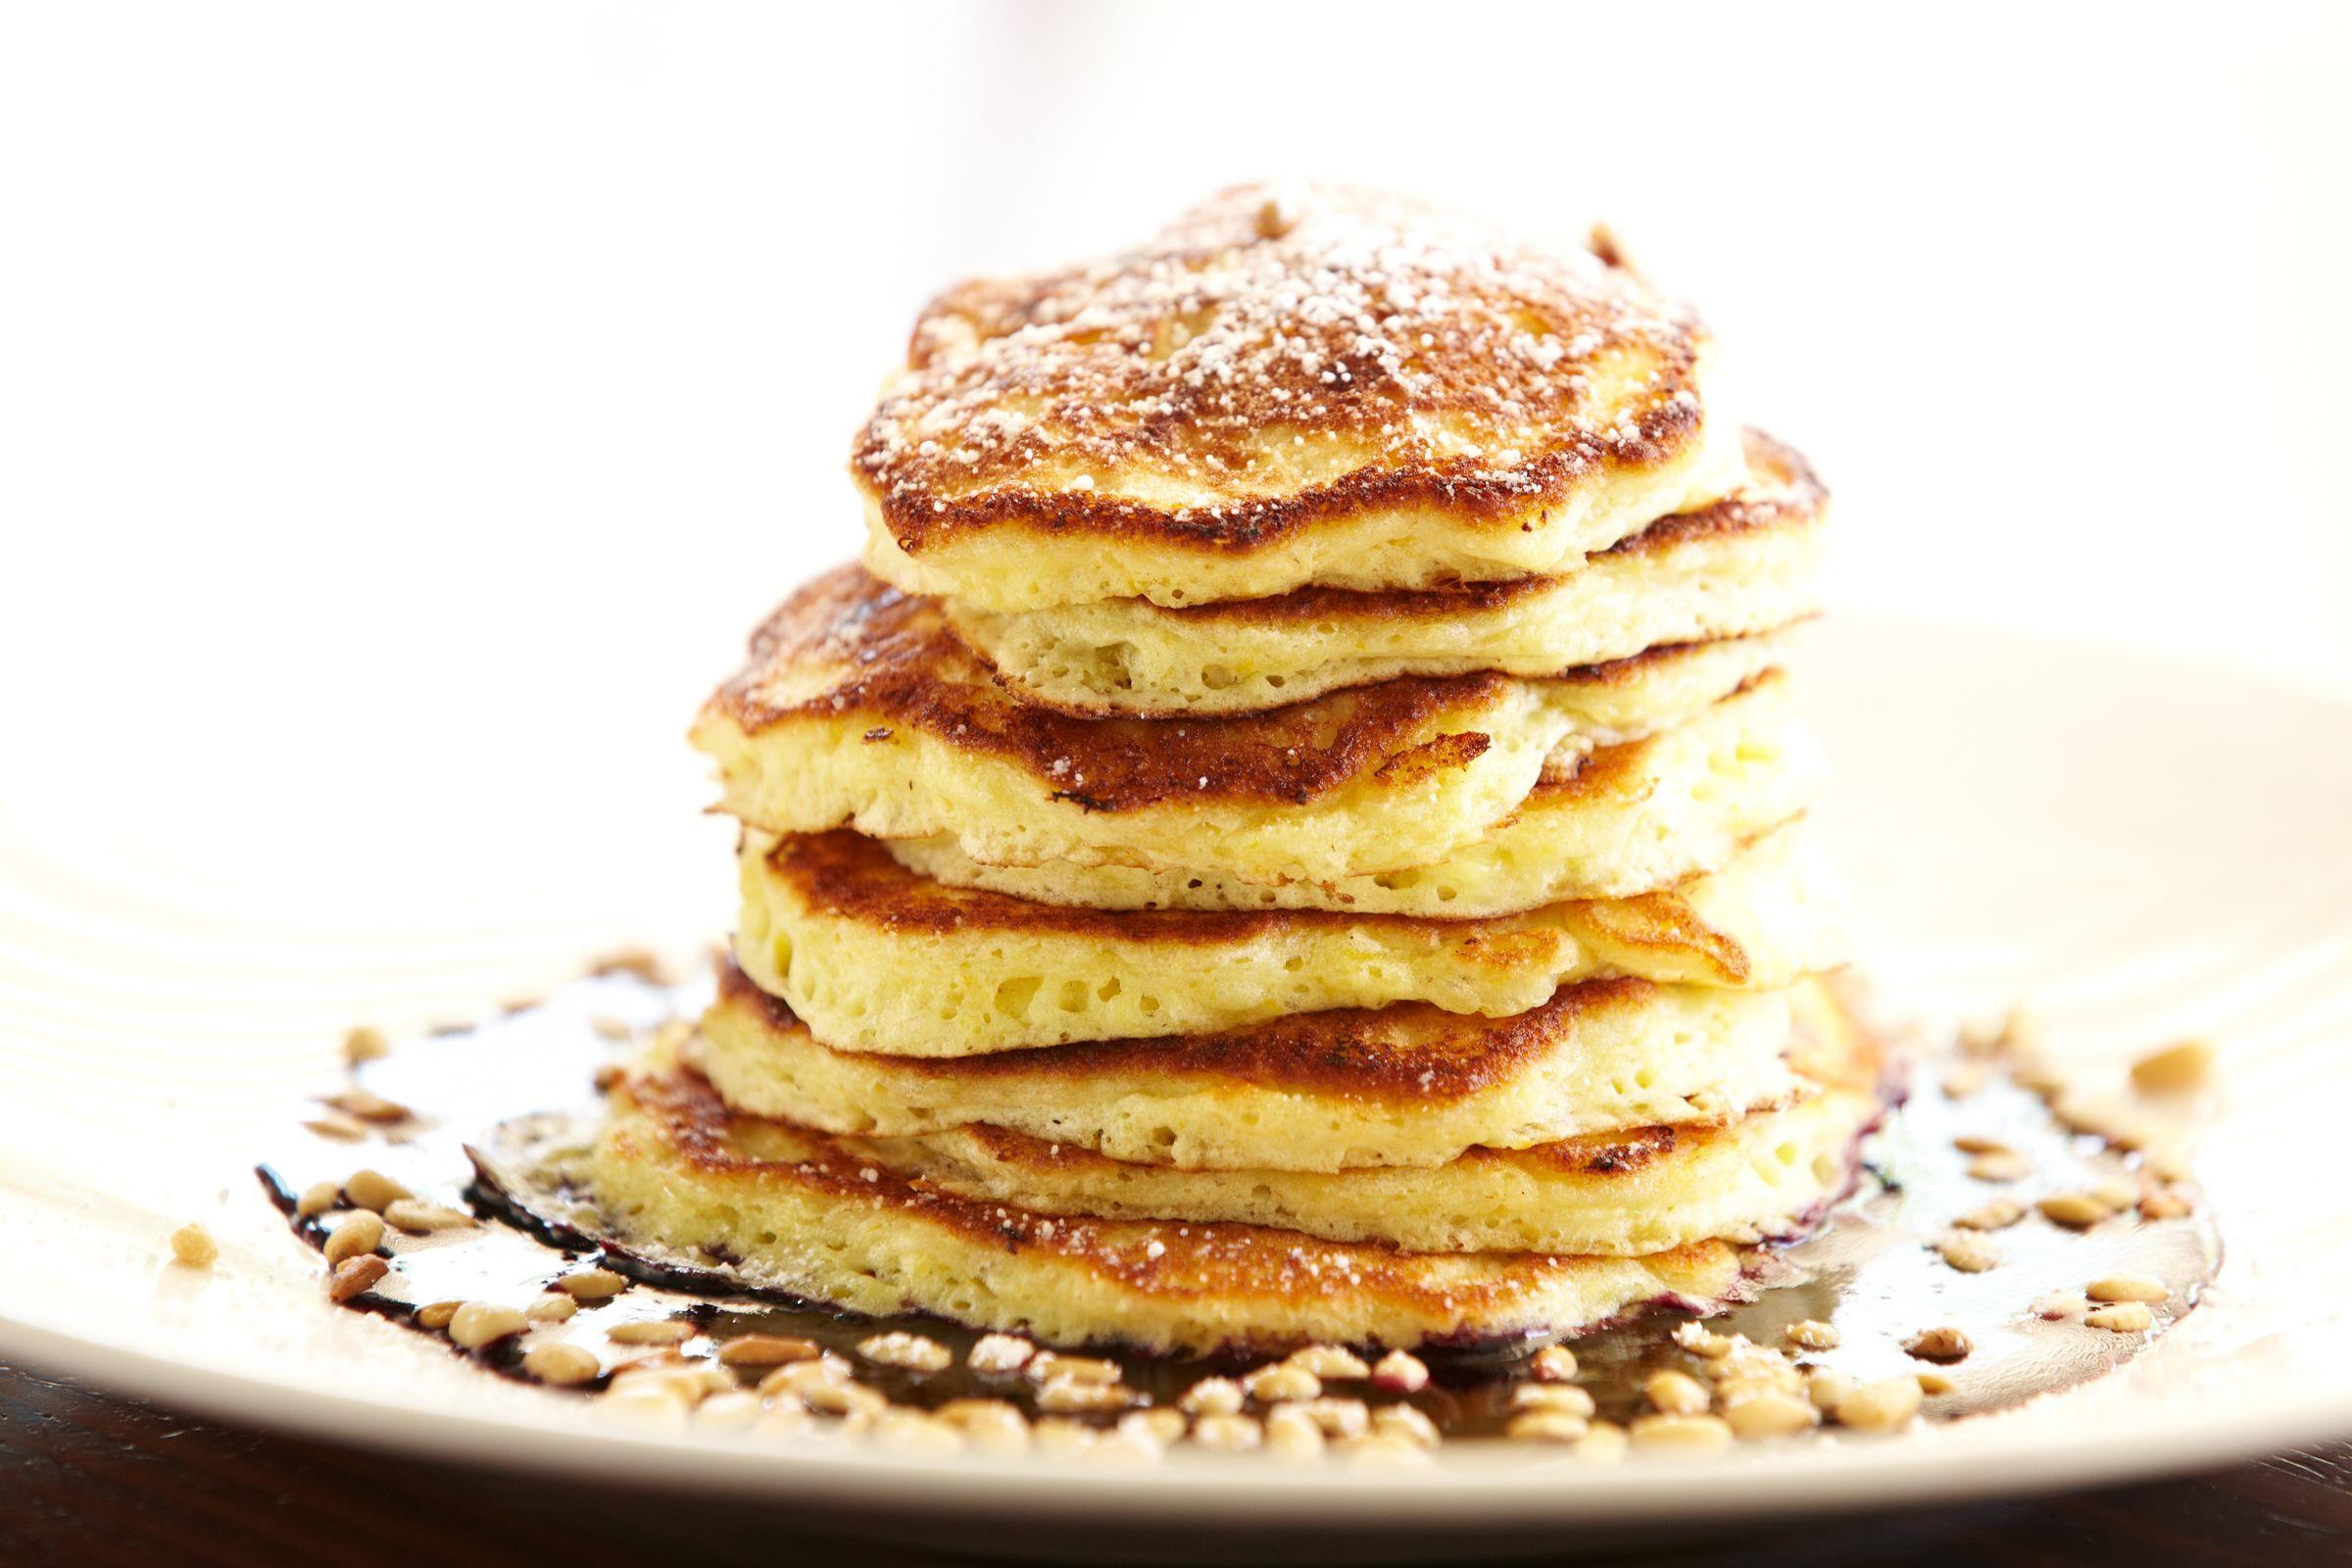 Pancake Recipe From Hotel Jerome Lemon Souffle Pancake Food